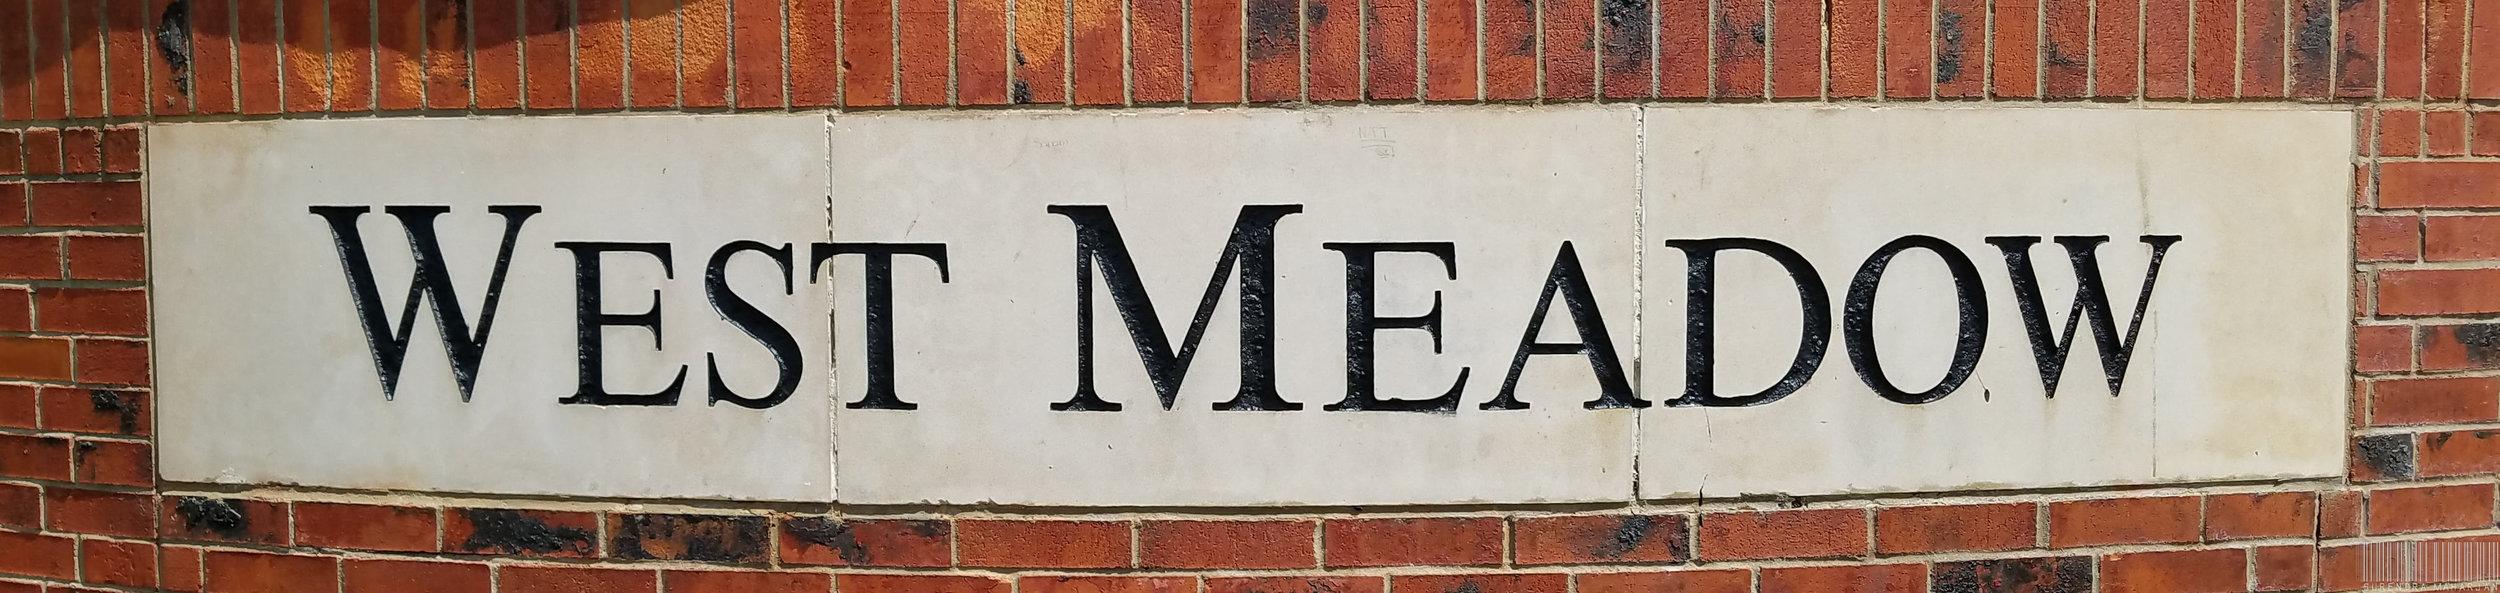 56_West Meadow.jpg